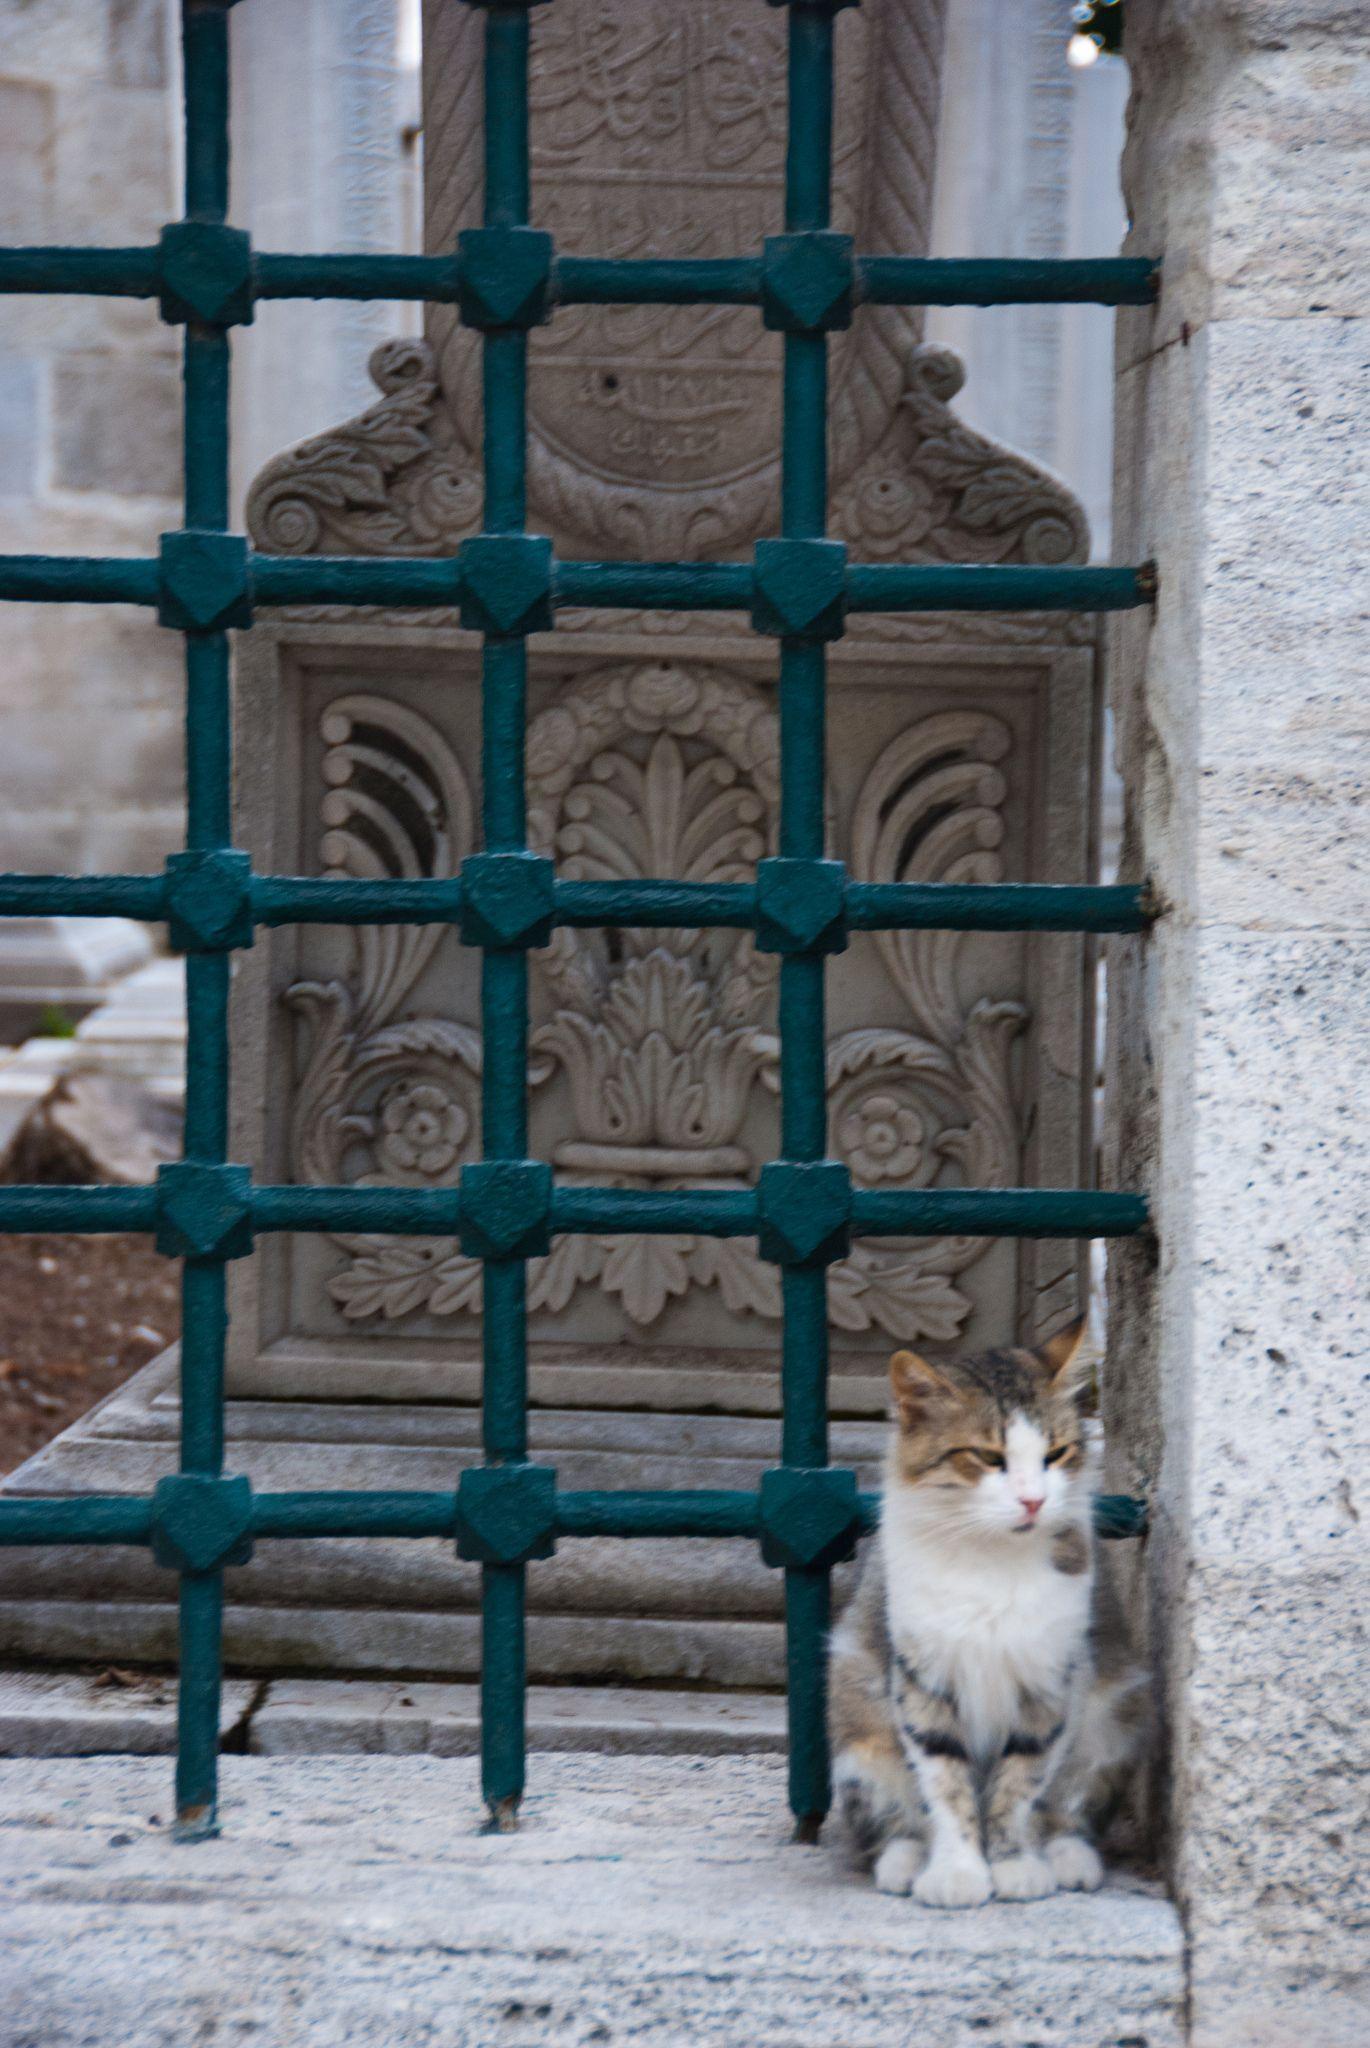 https://flic.kr/p/de8HKs | Ístanbul | Süleymaniye Mosque - Cat at the cemetery